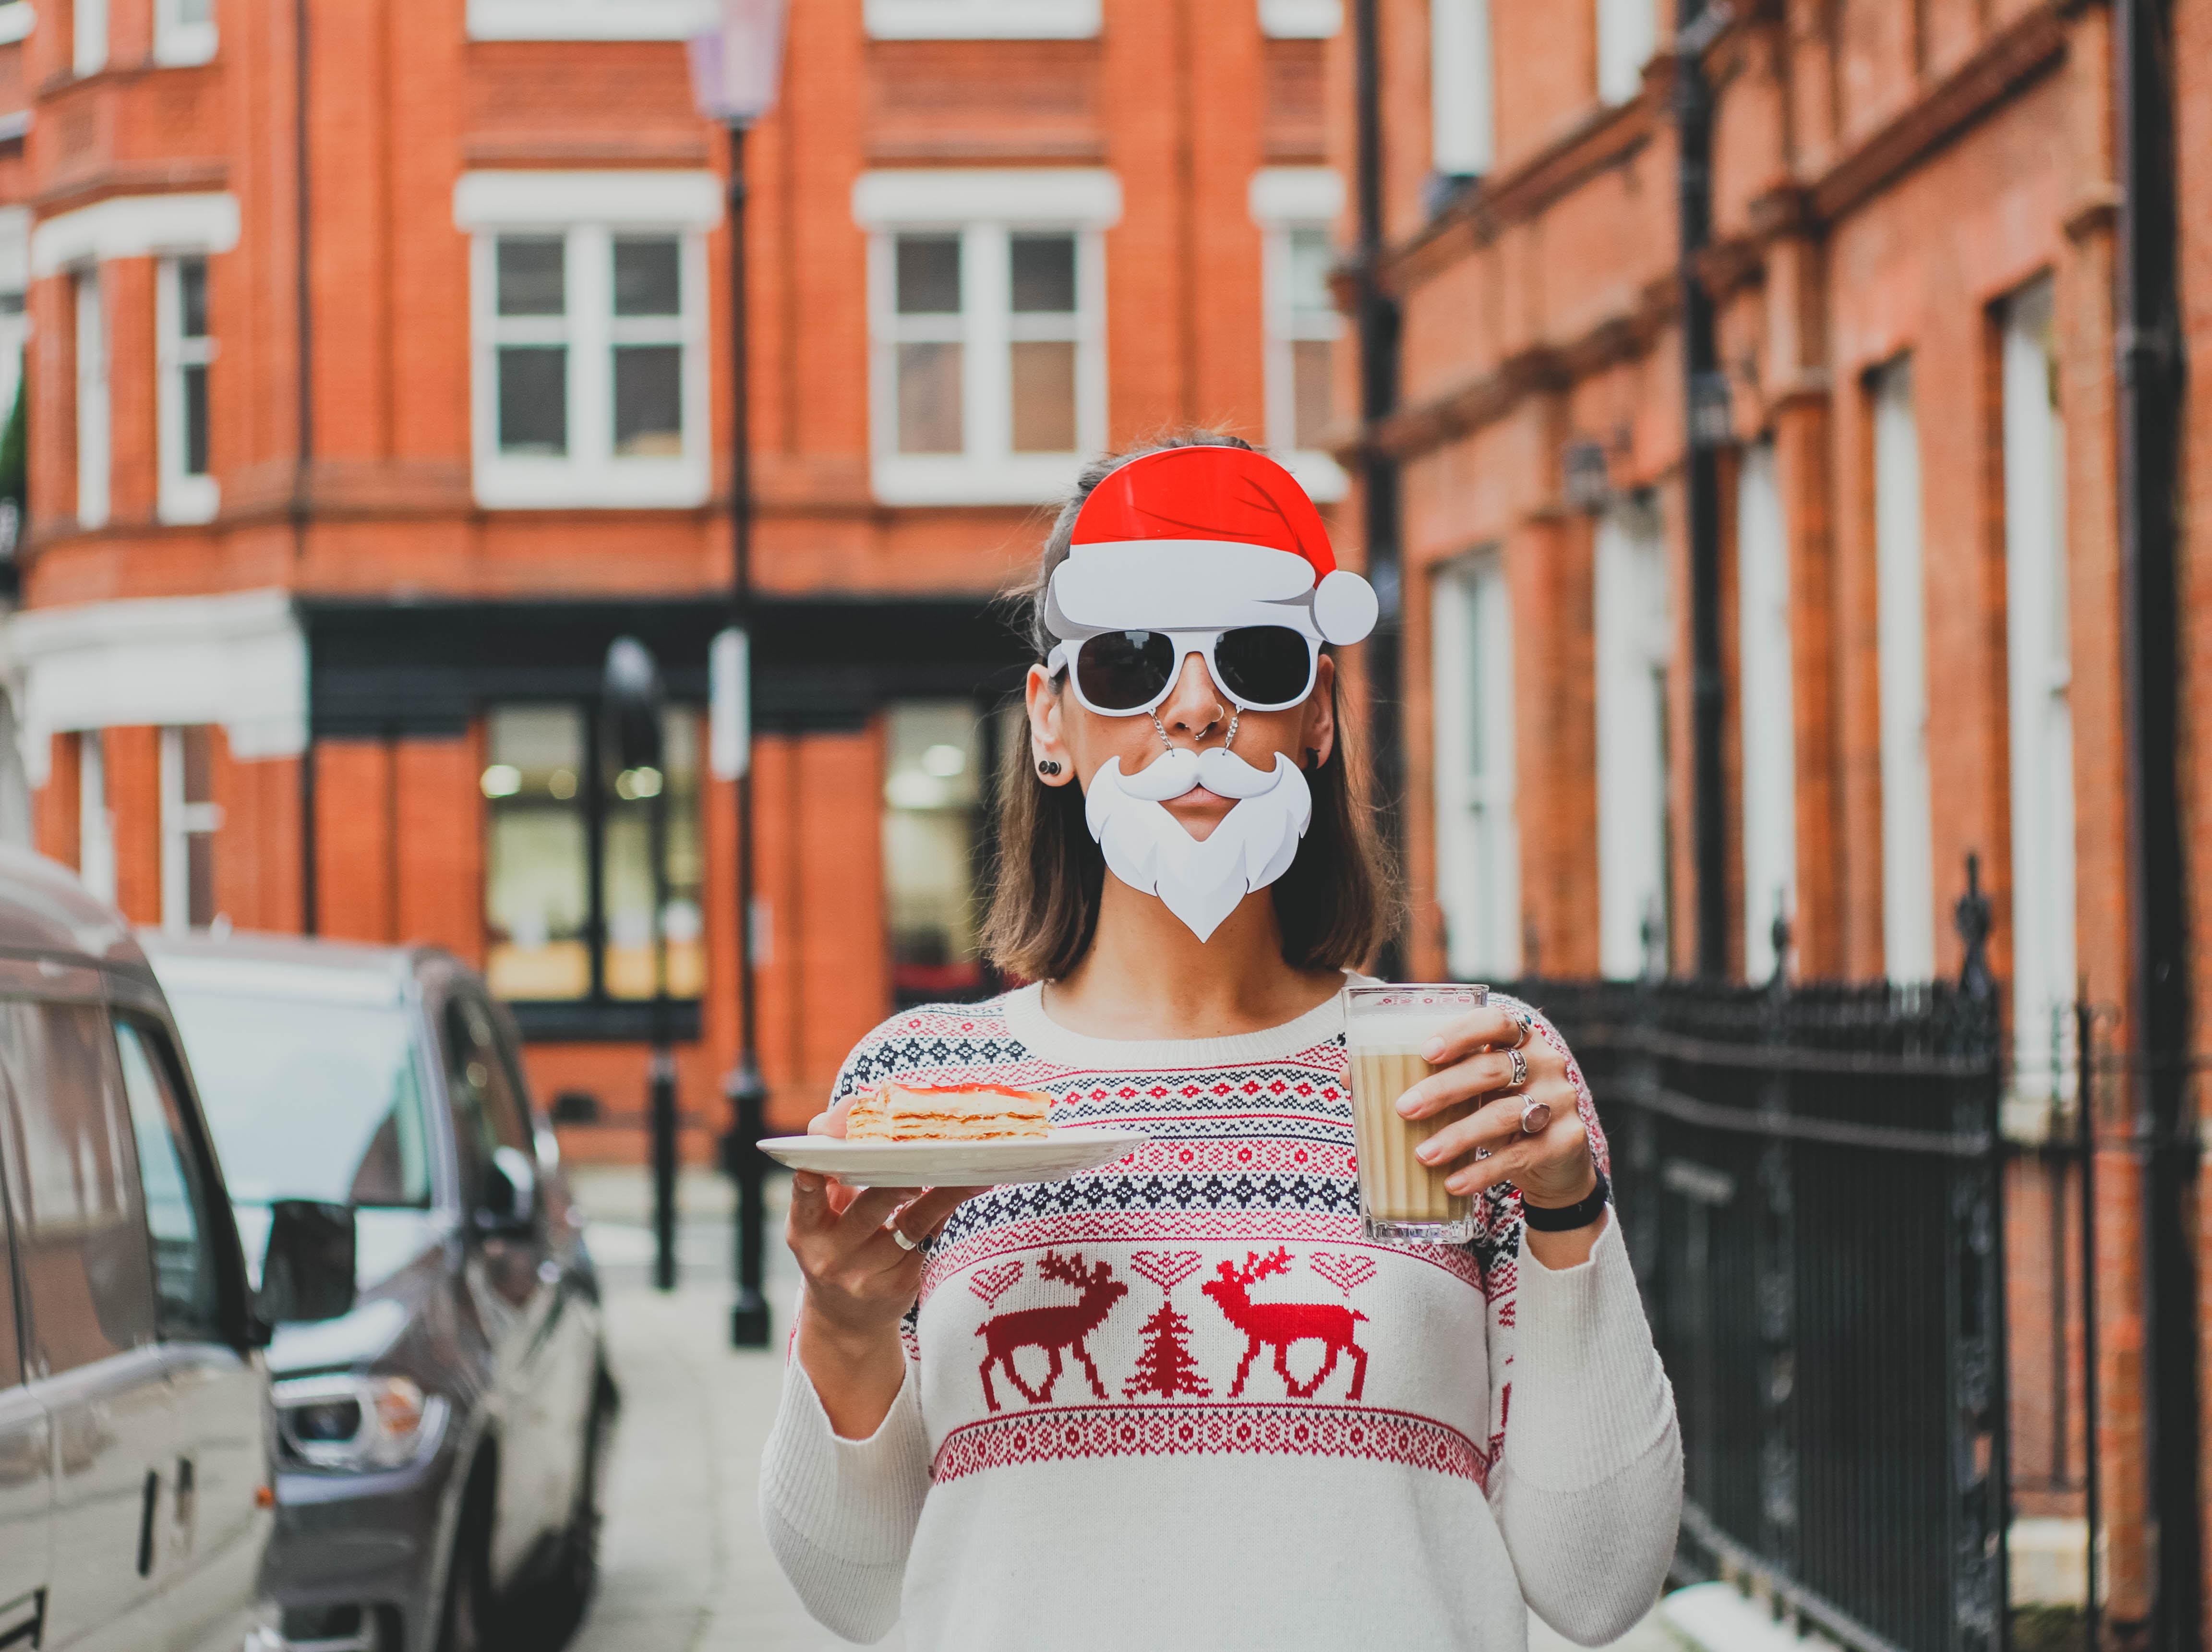 Ugly Holiday Sweater 101 image